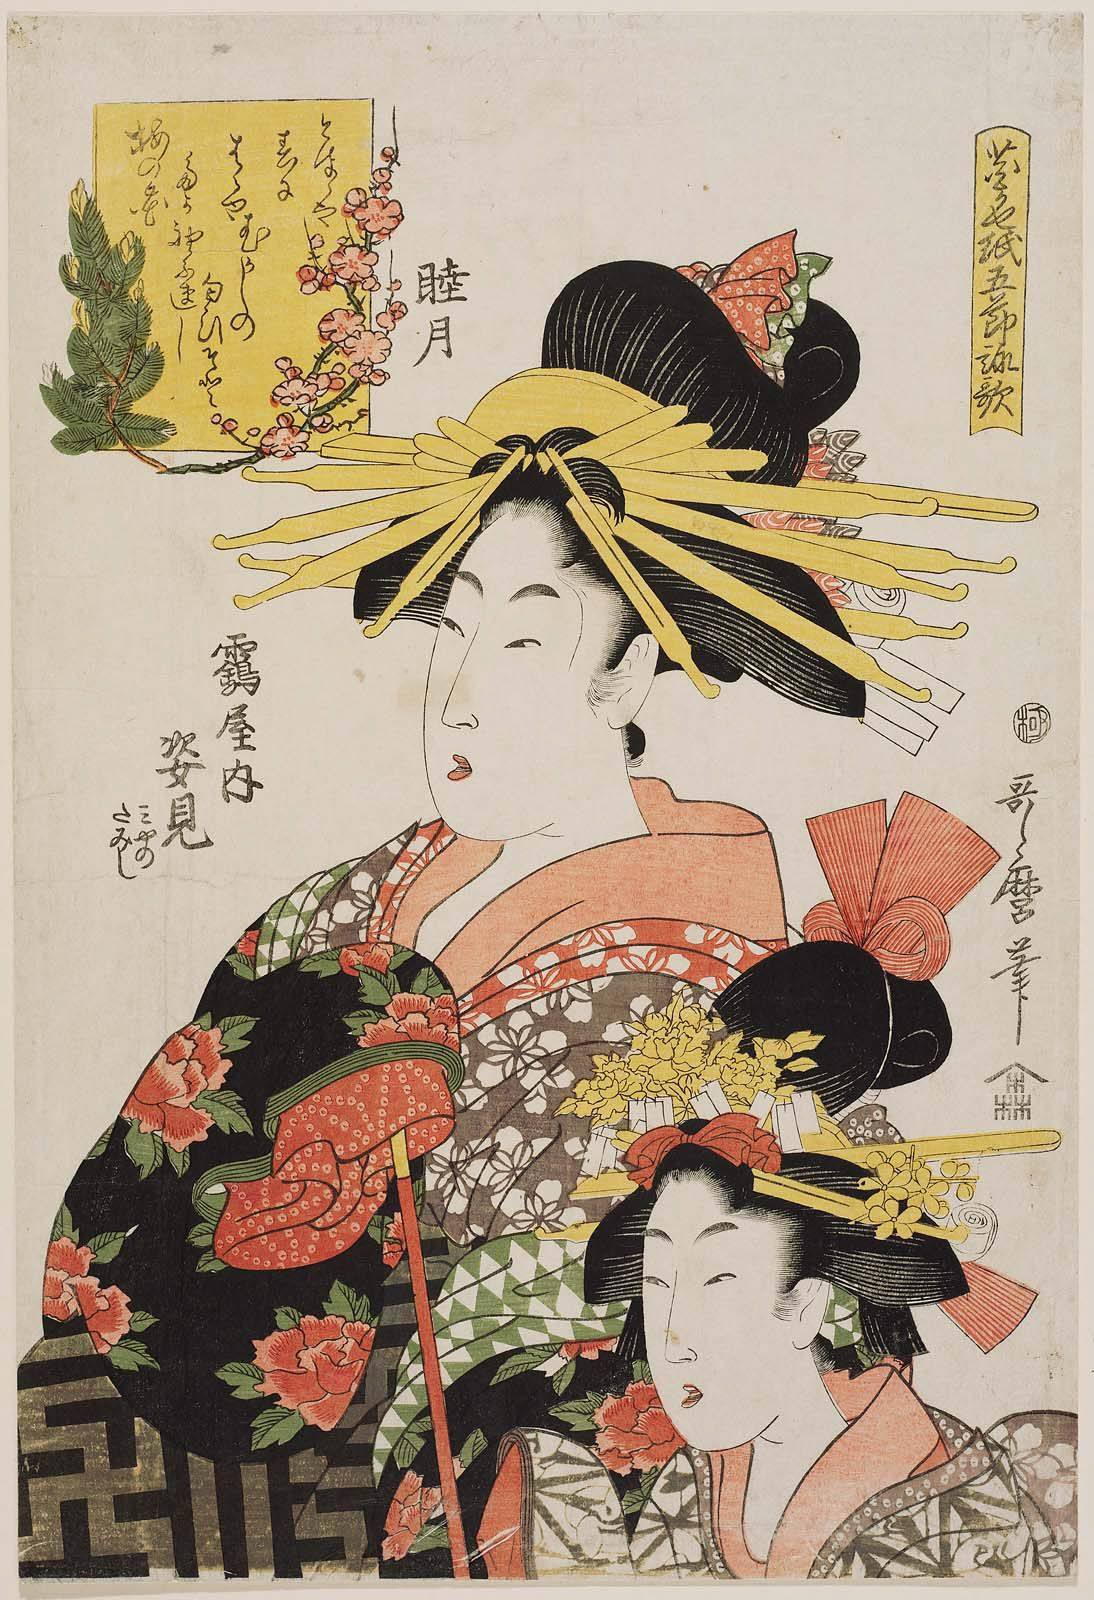 Dating Ιαπωνικά κεραμικά